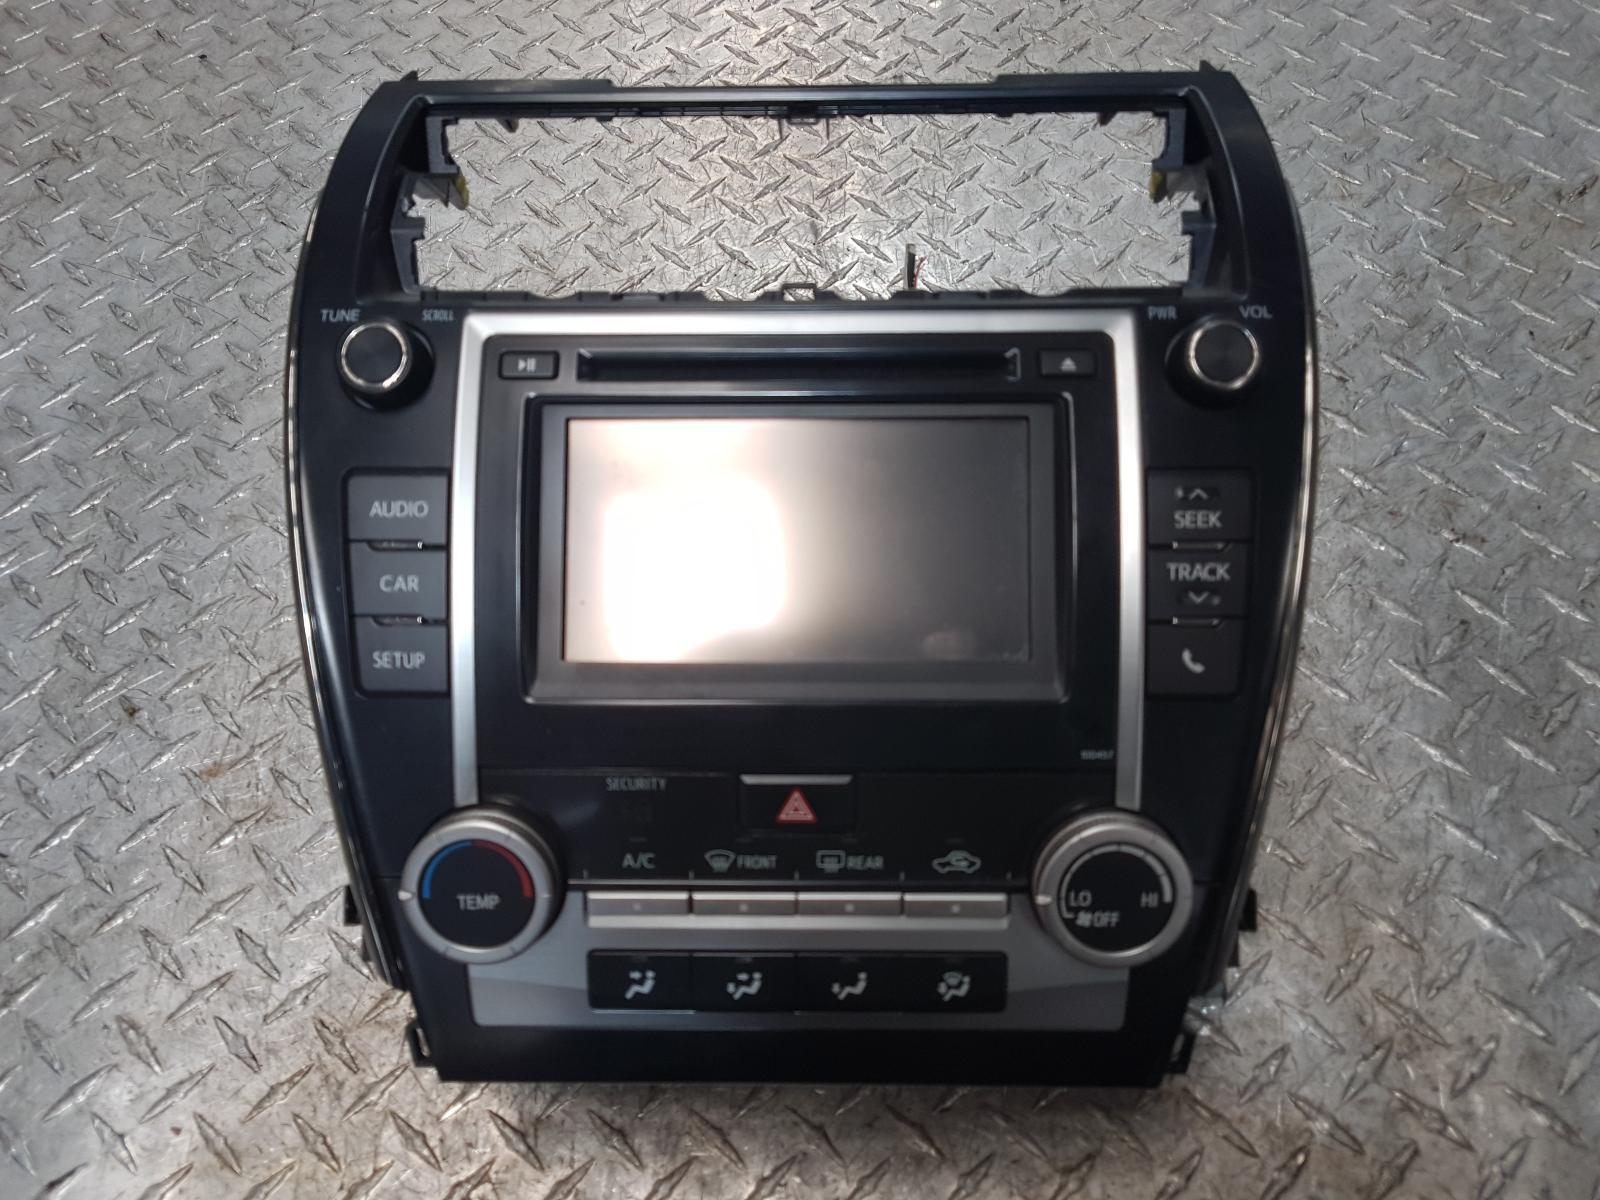 View Auto part Radio/Cd/Dvd/Sat/Tv Toyota Camry 2014